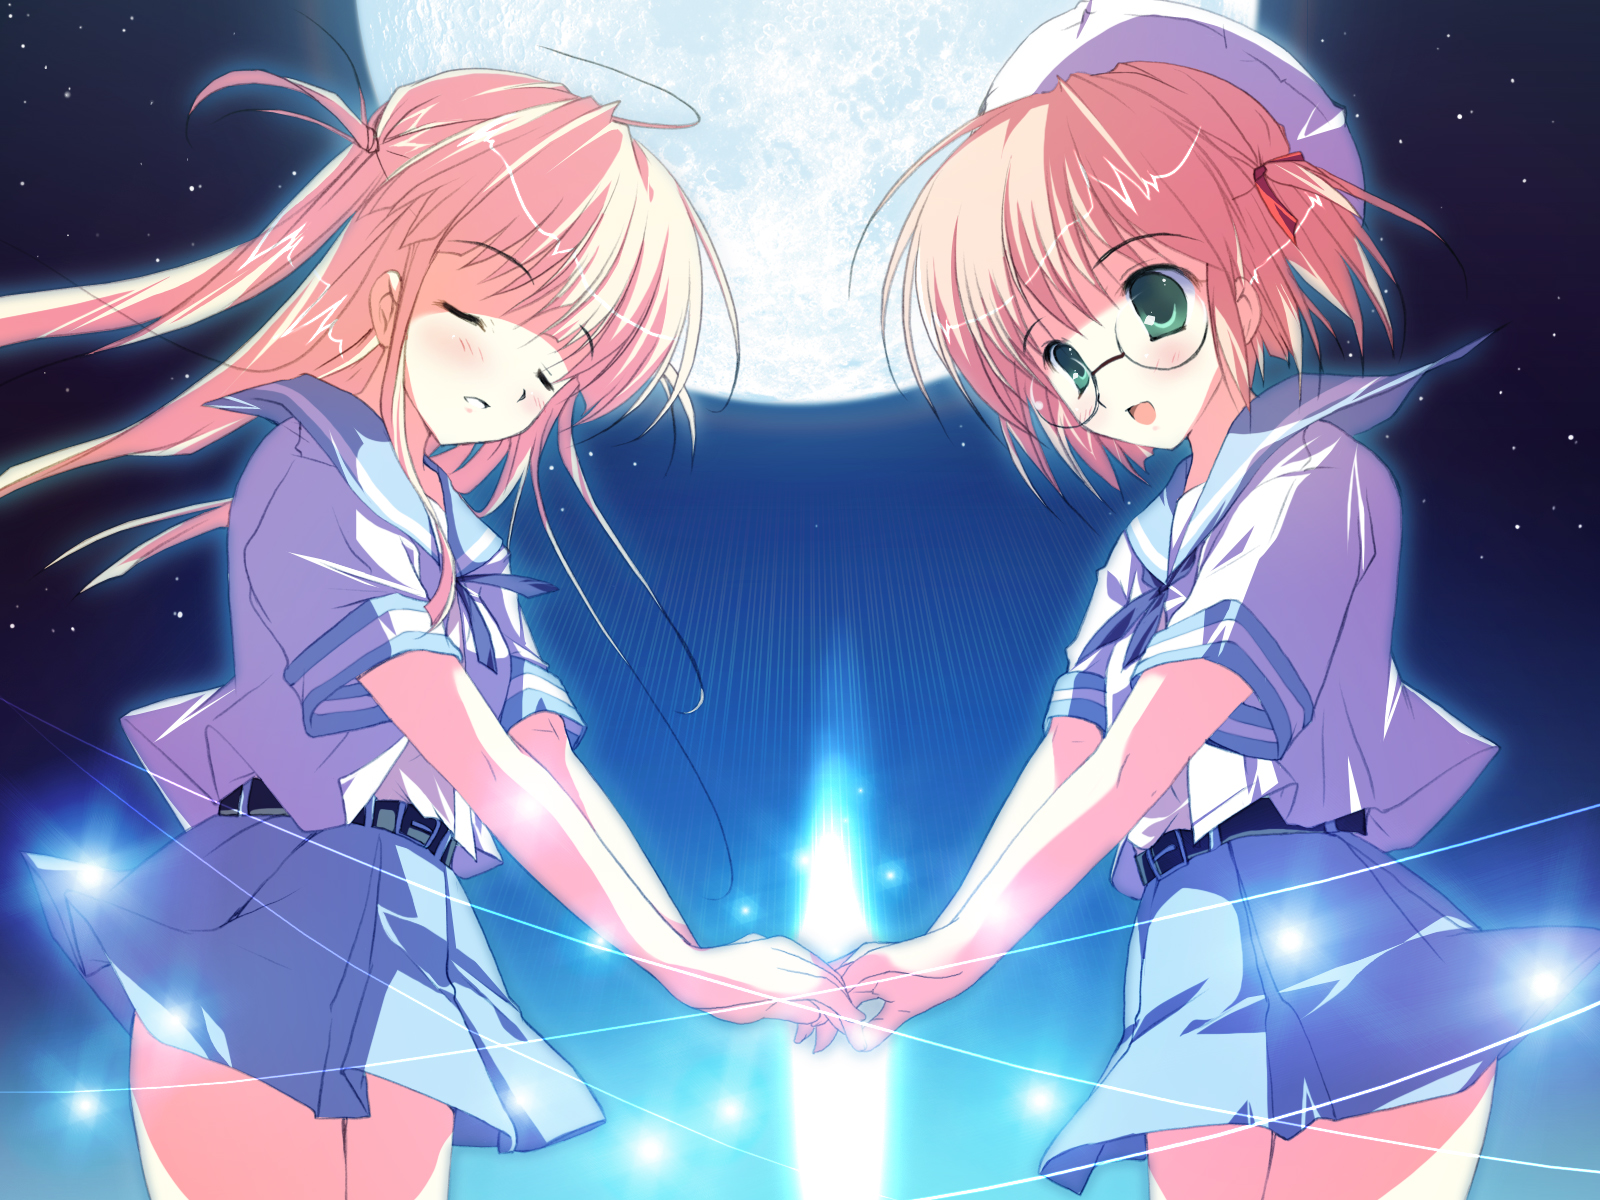 2girls glasses green_eyes hat long_hair mikeou moon night original pink_hair ribbons school_uniform short_hair shoujo_ai sky stars